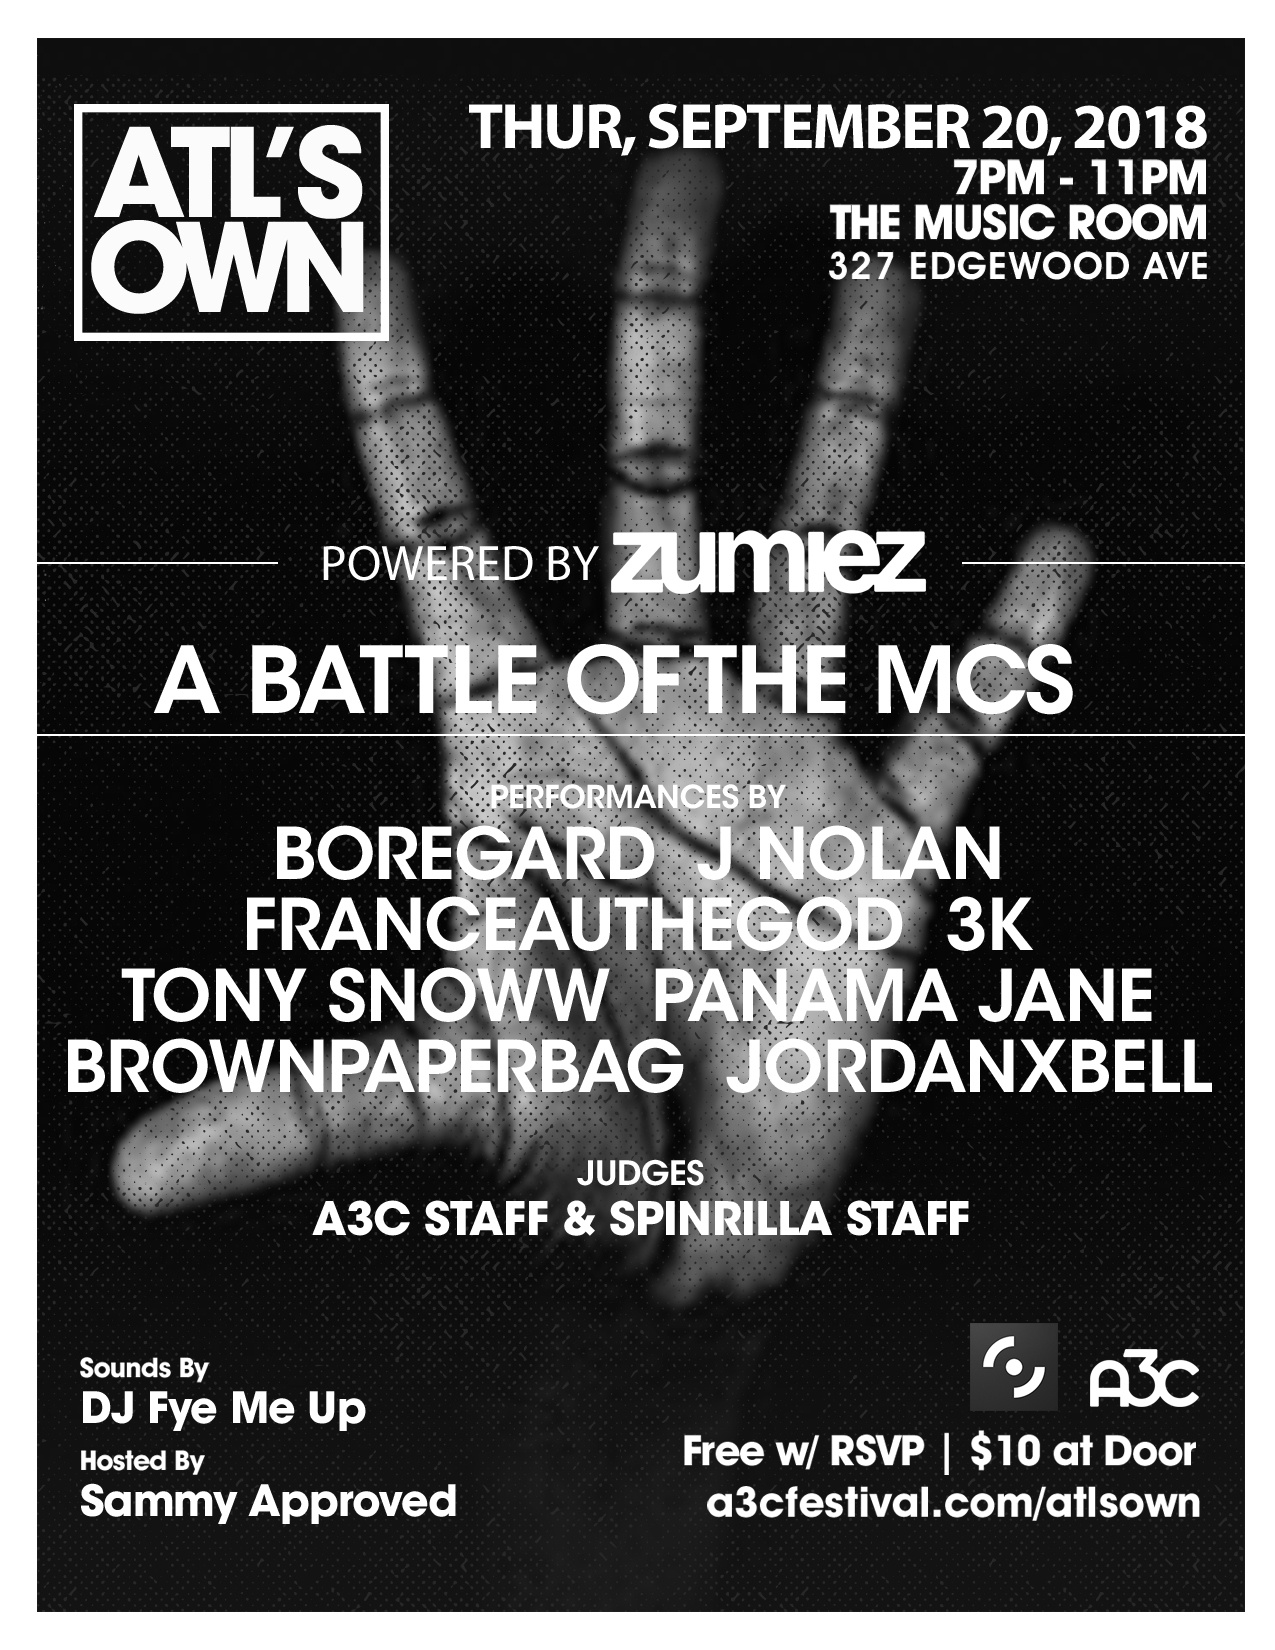 Battle of the MCs - ATLs Own4.25x5.5 (9)